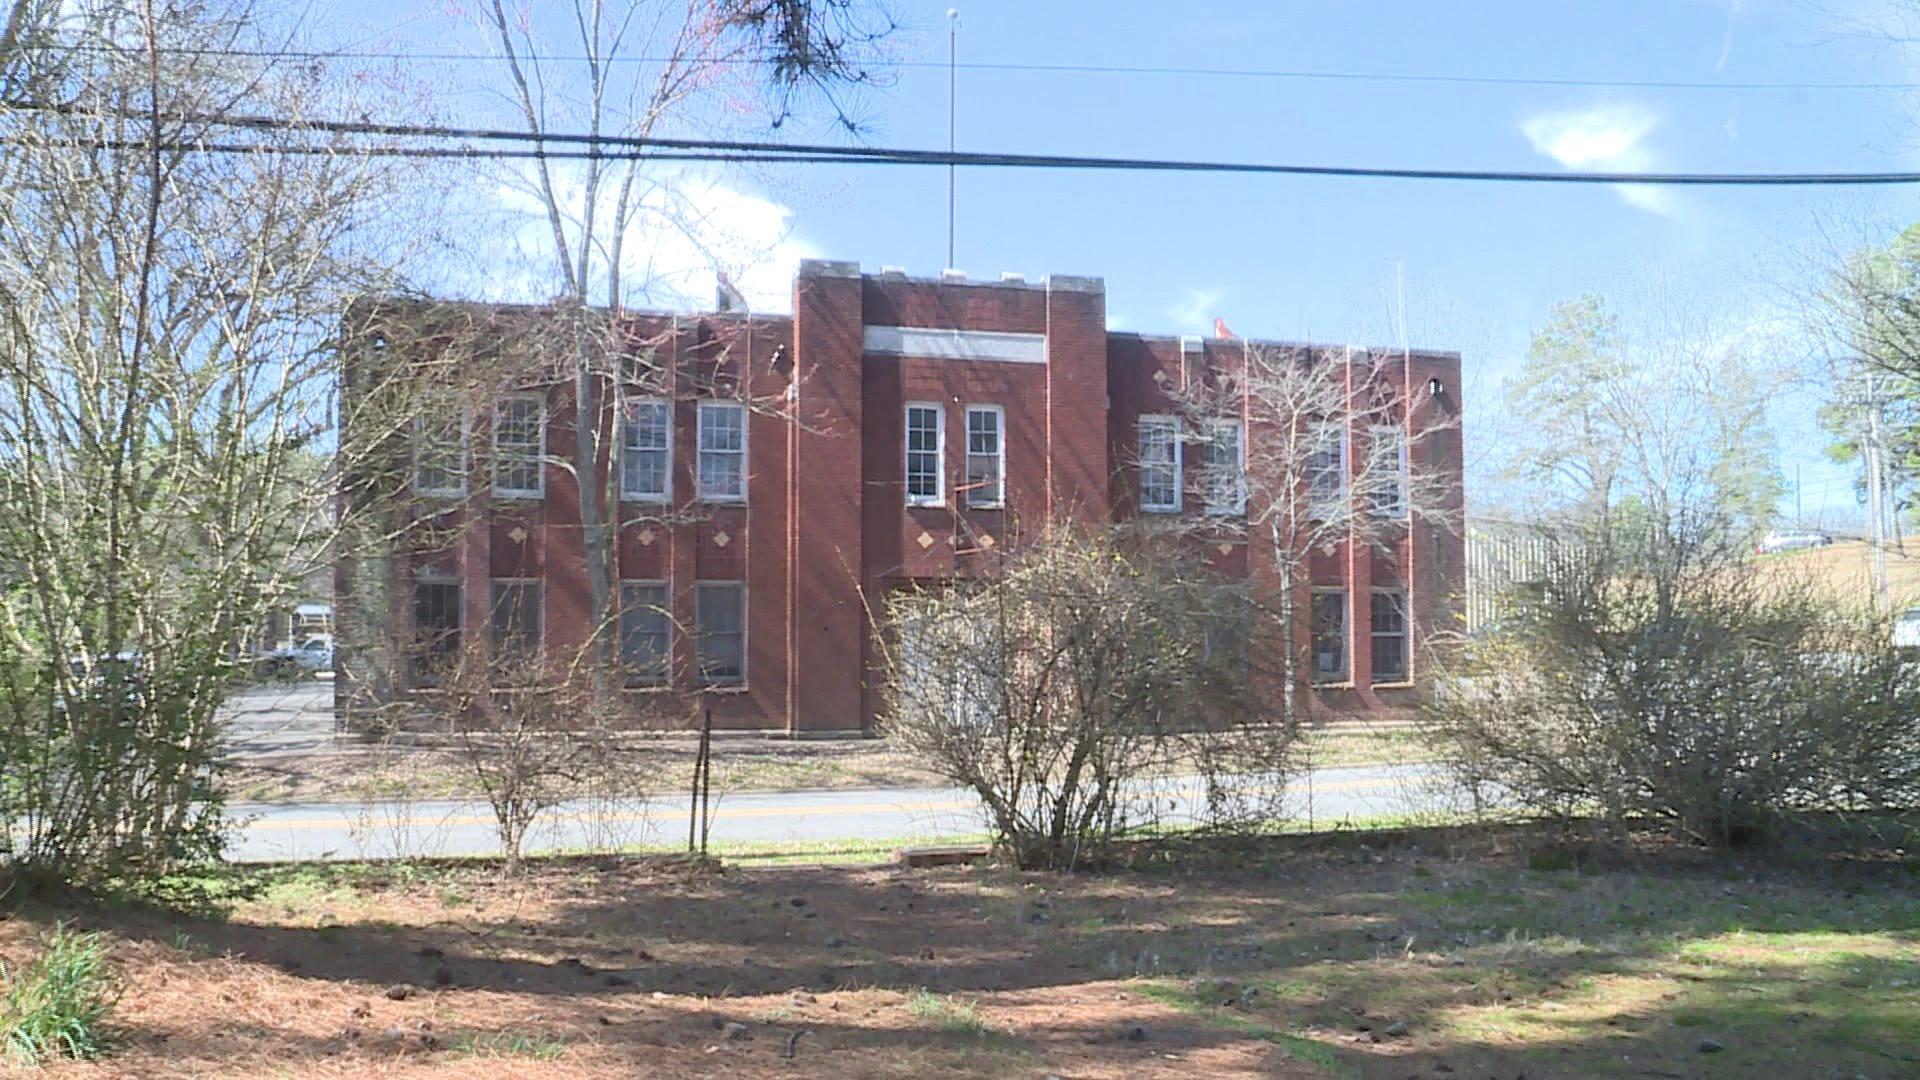 clarksville building